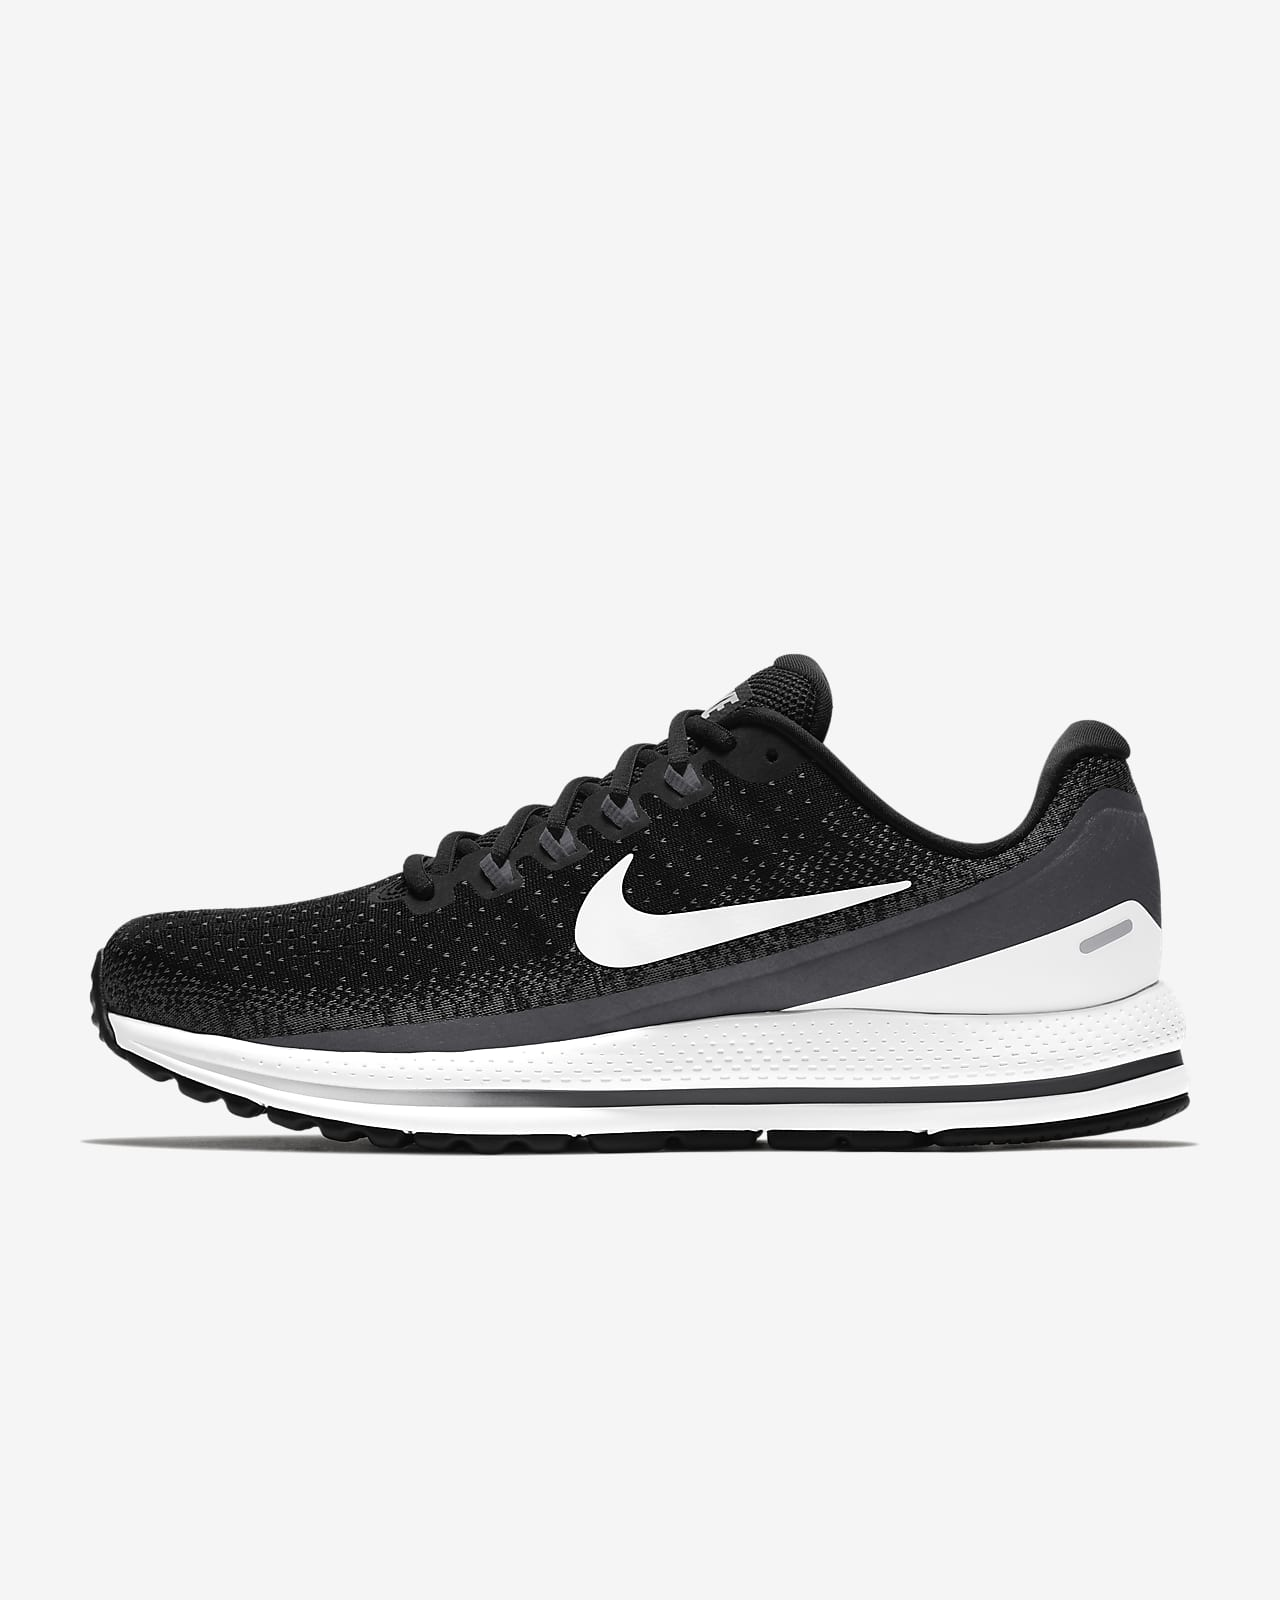 Nike Air Zoom Vomero 13 男子跑步鞋